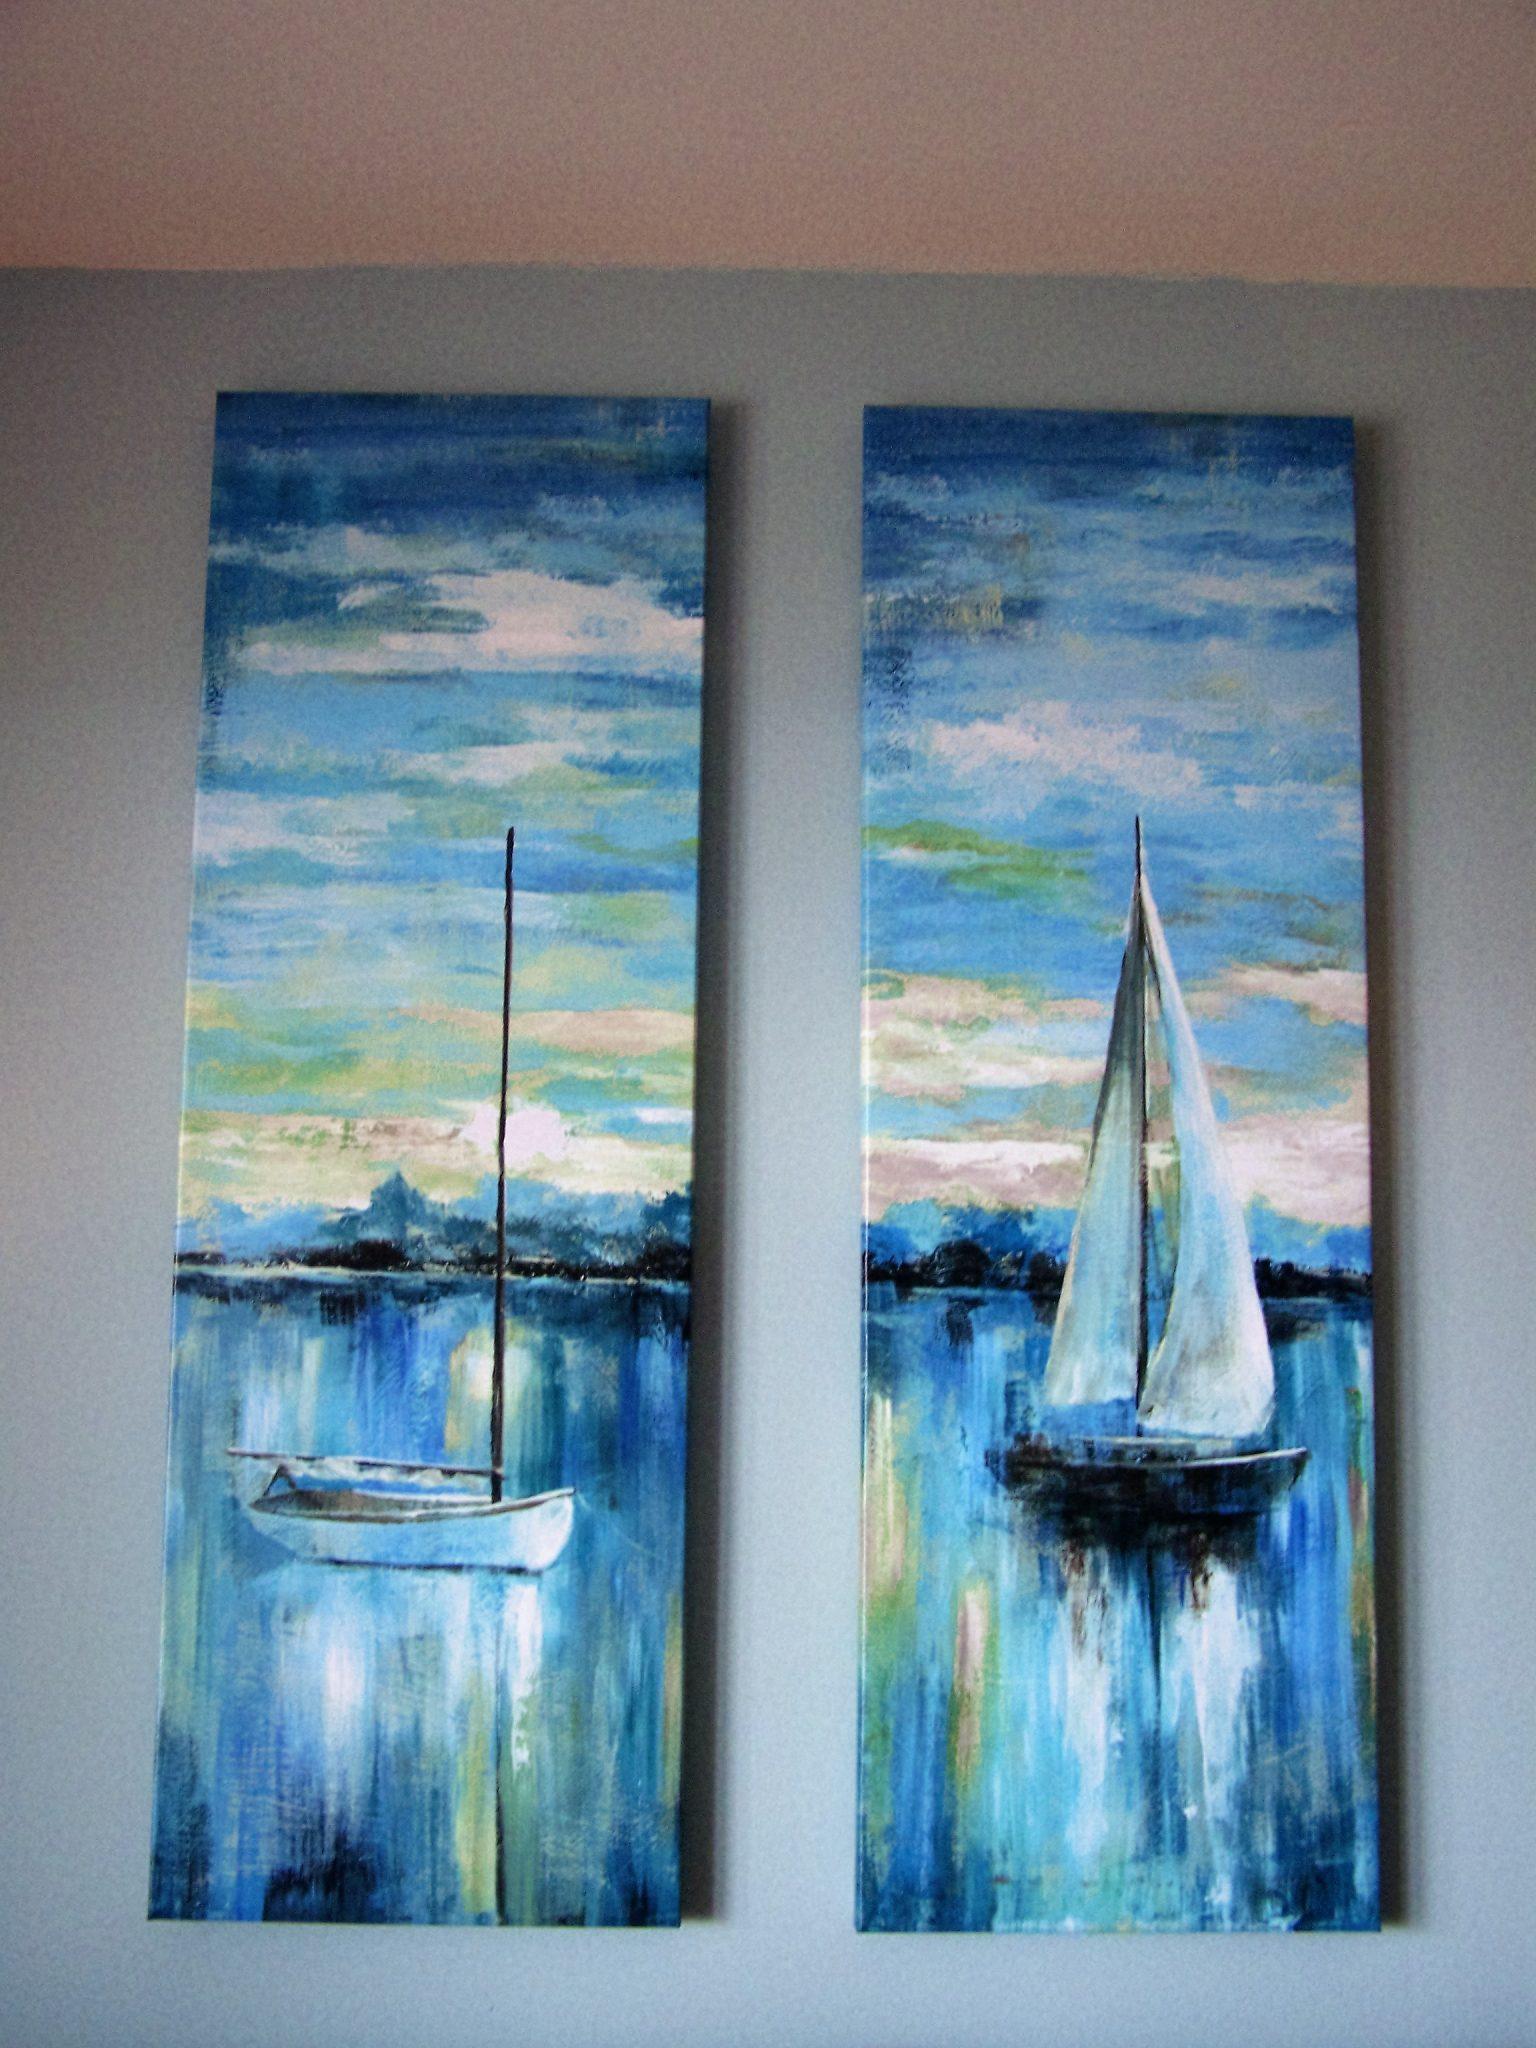 Fishing Boat Artwork   Furniture Accessories Supplier in Panama, FL.